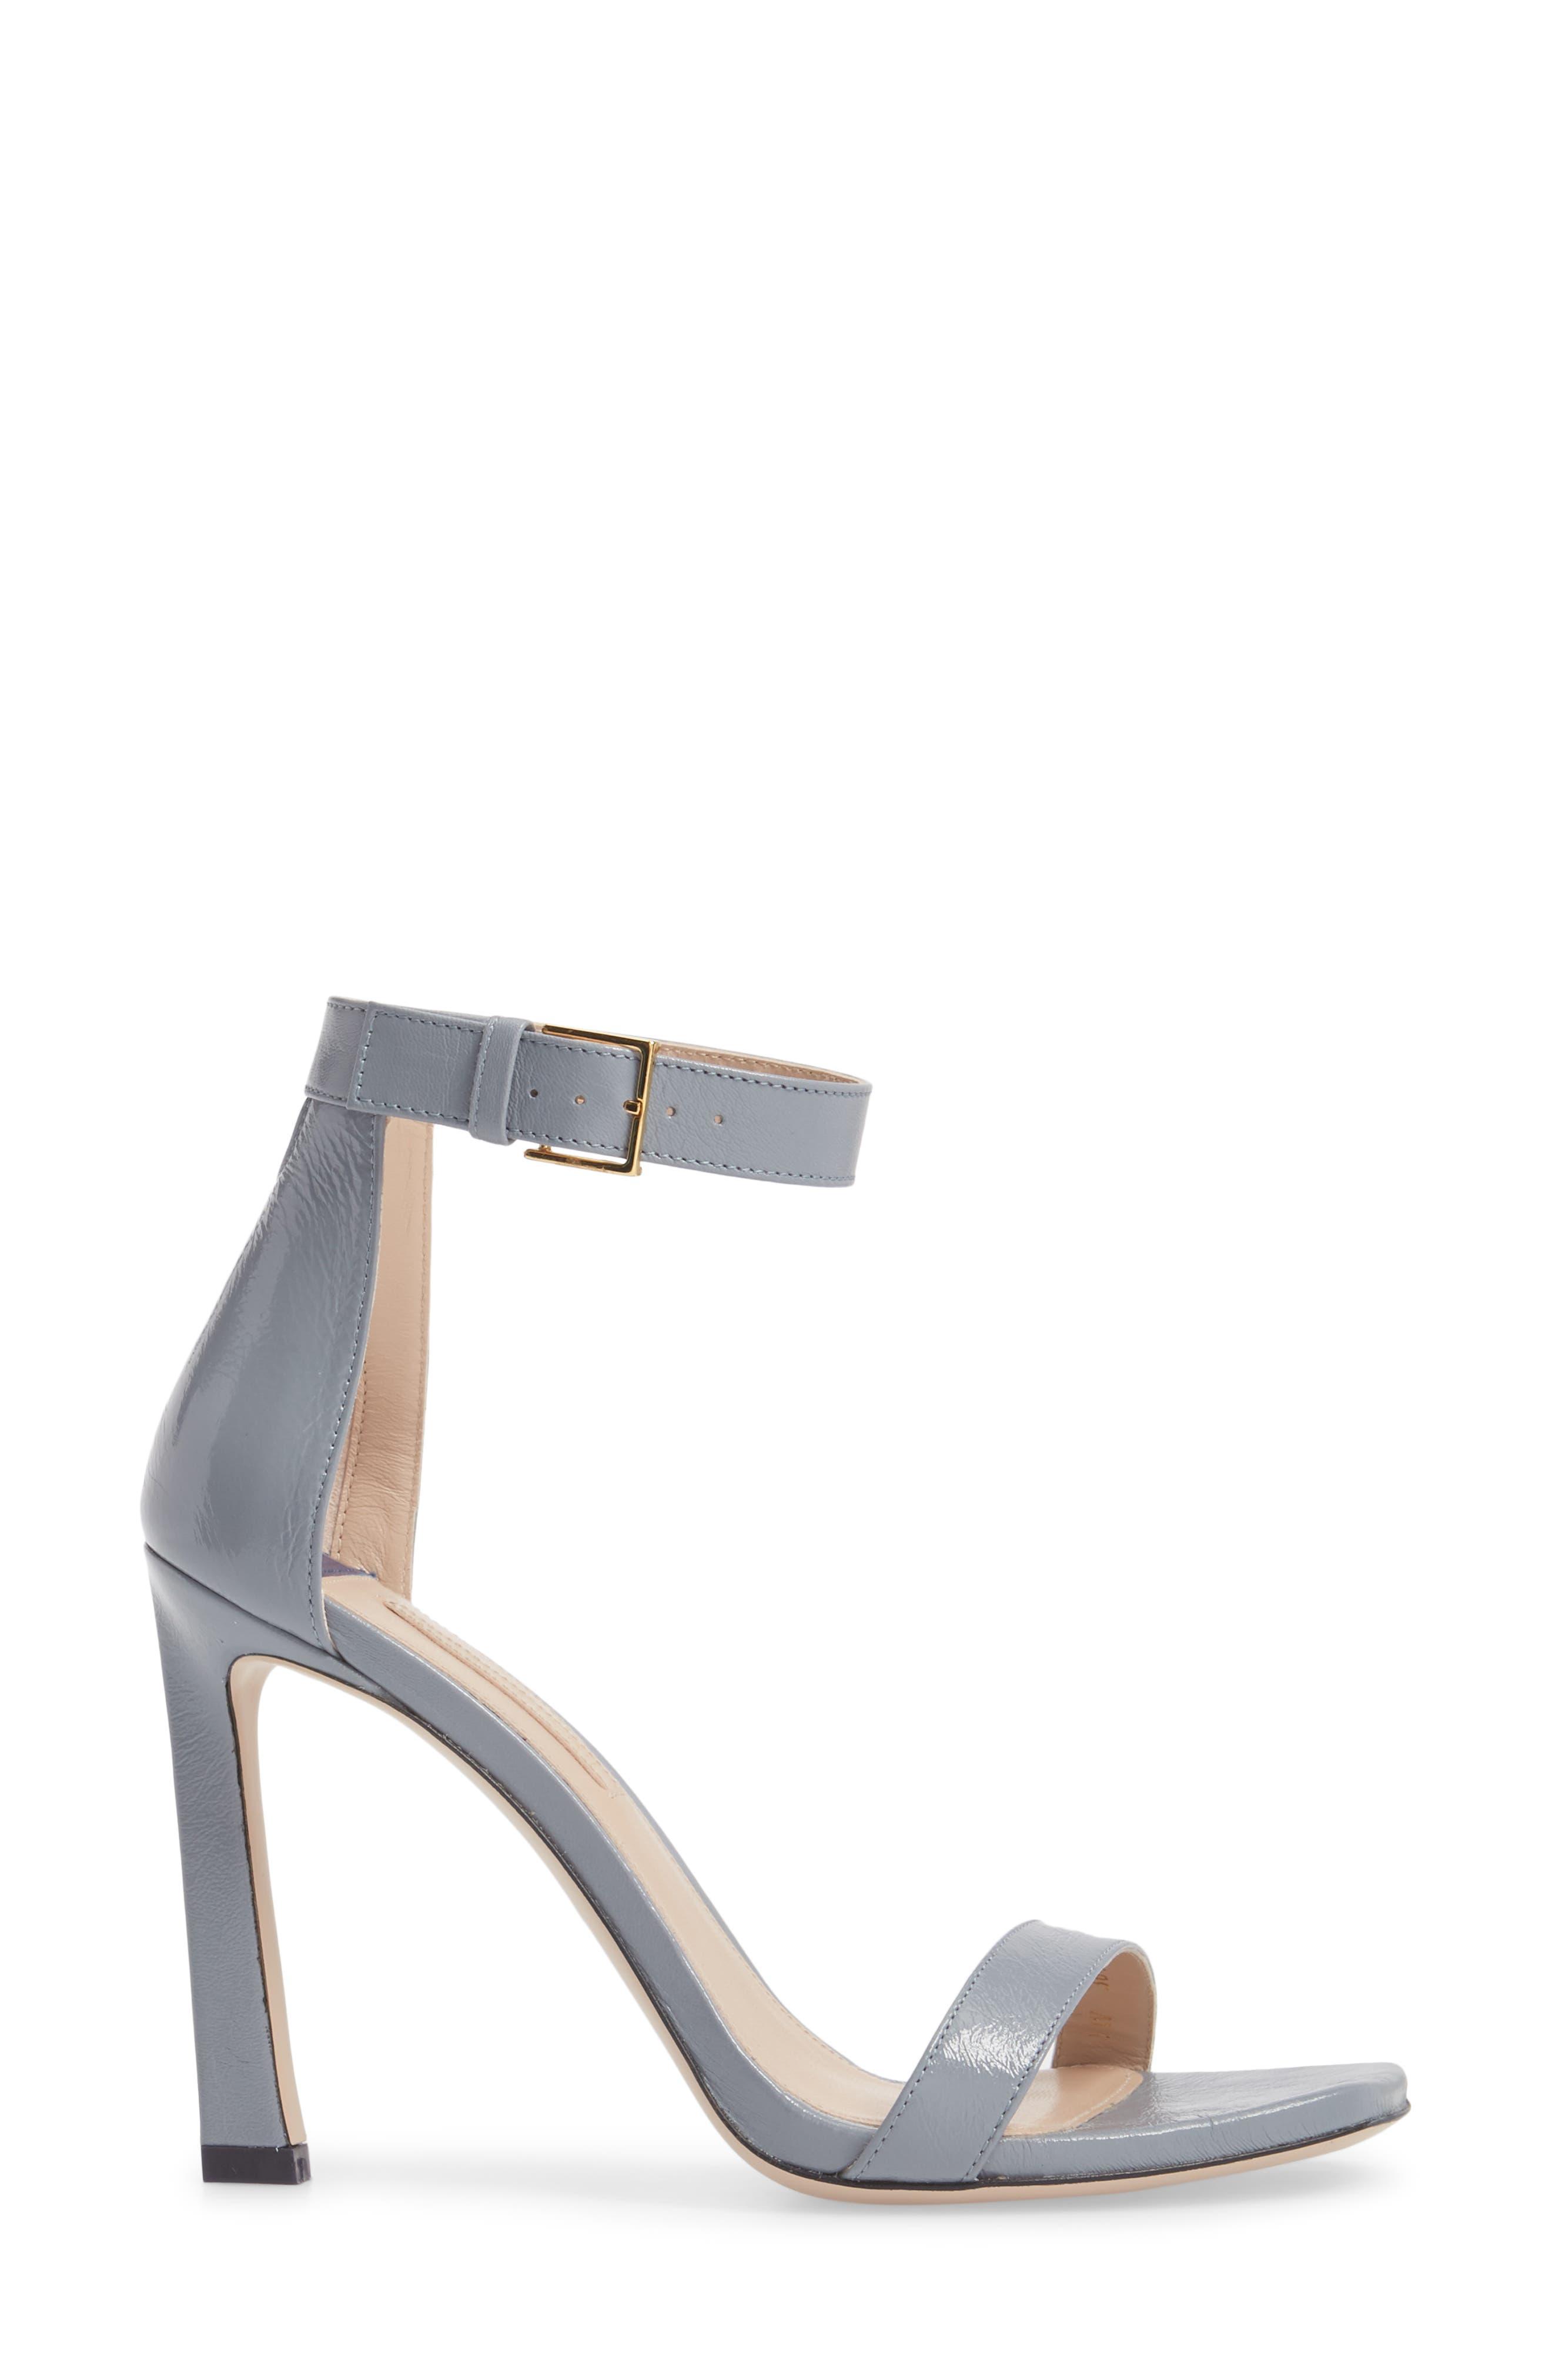 100SQUARENUDIST Sandal,                             Alternate thumbnail 3, color,                             Dovetail Gleaming Tripon